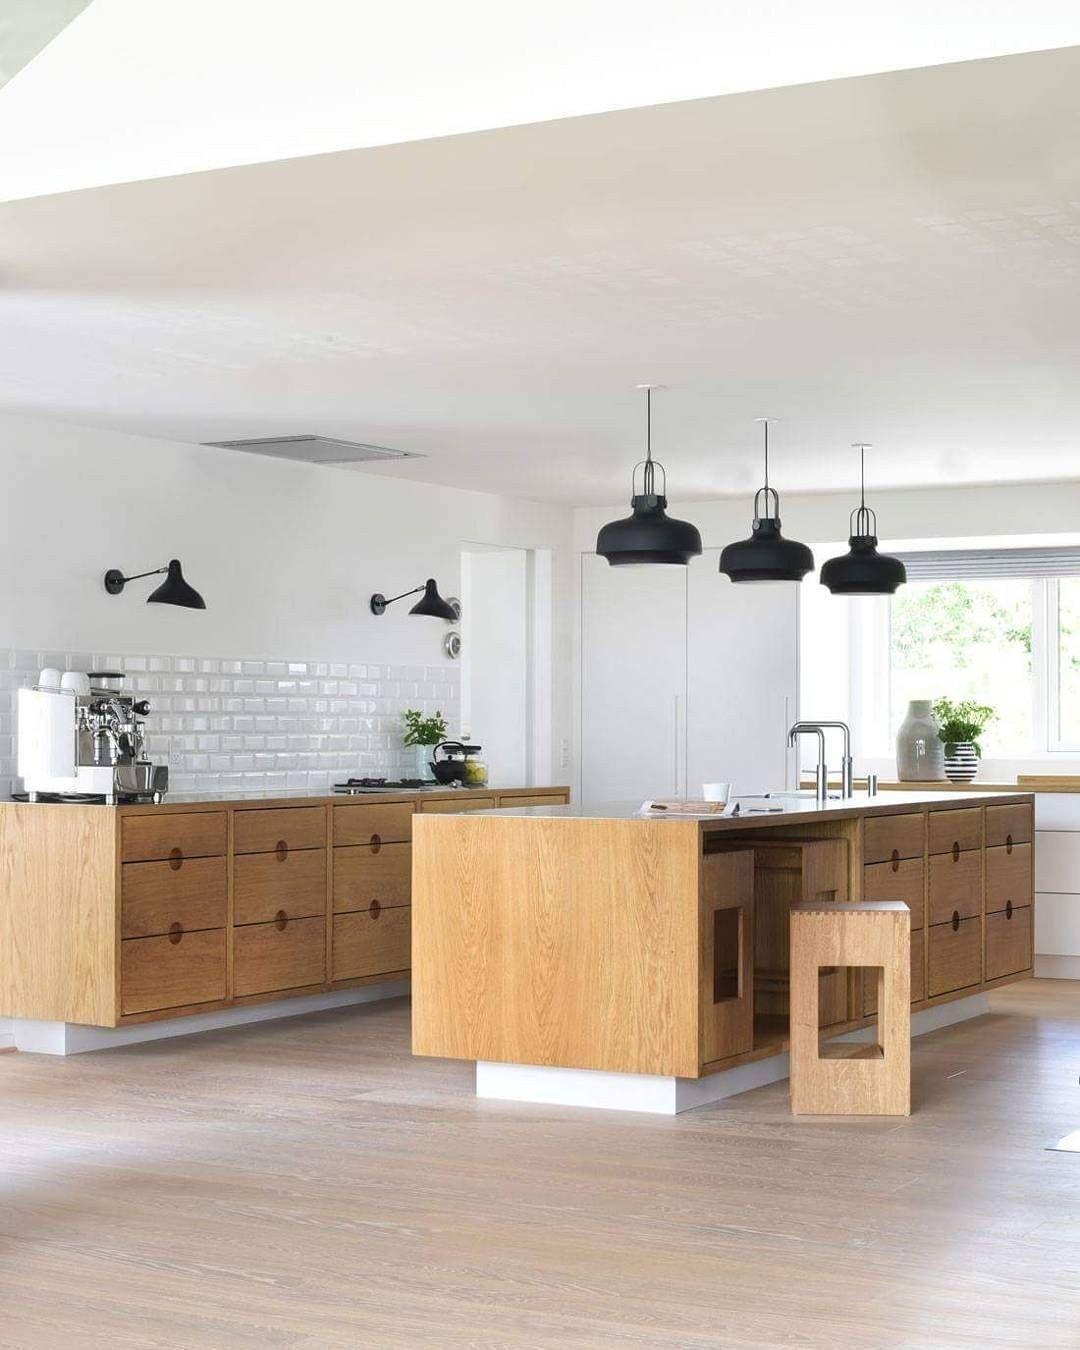 45 Awesome Modern Scandinavian Kitchen Ideas 37 Contemporary Kitchen Kitchen Design Small Scandinavian Kitchen